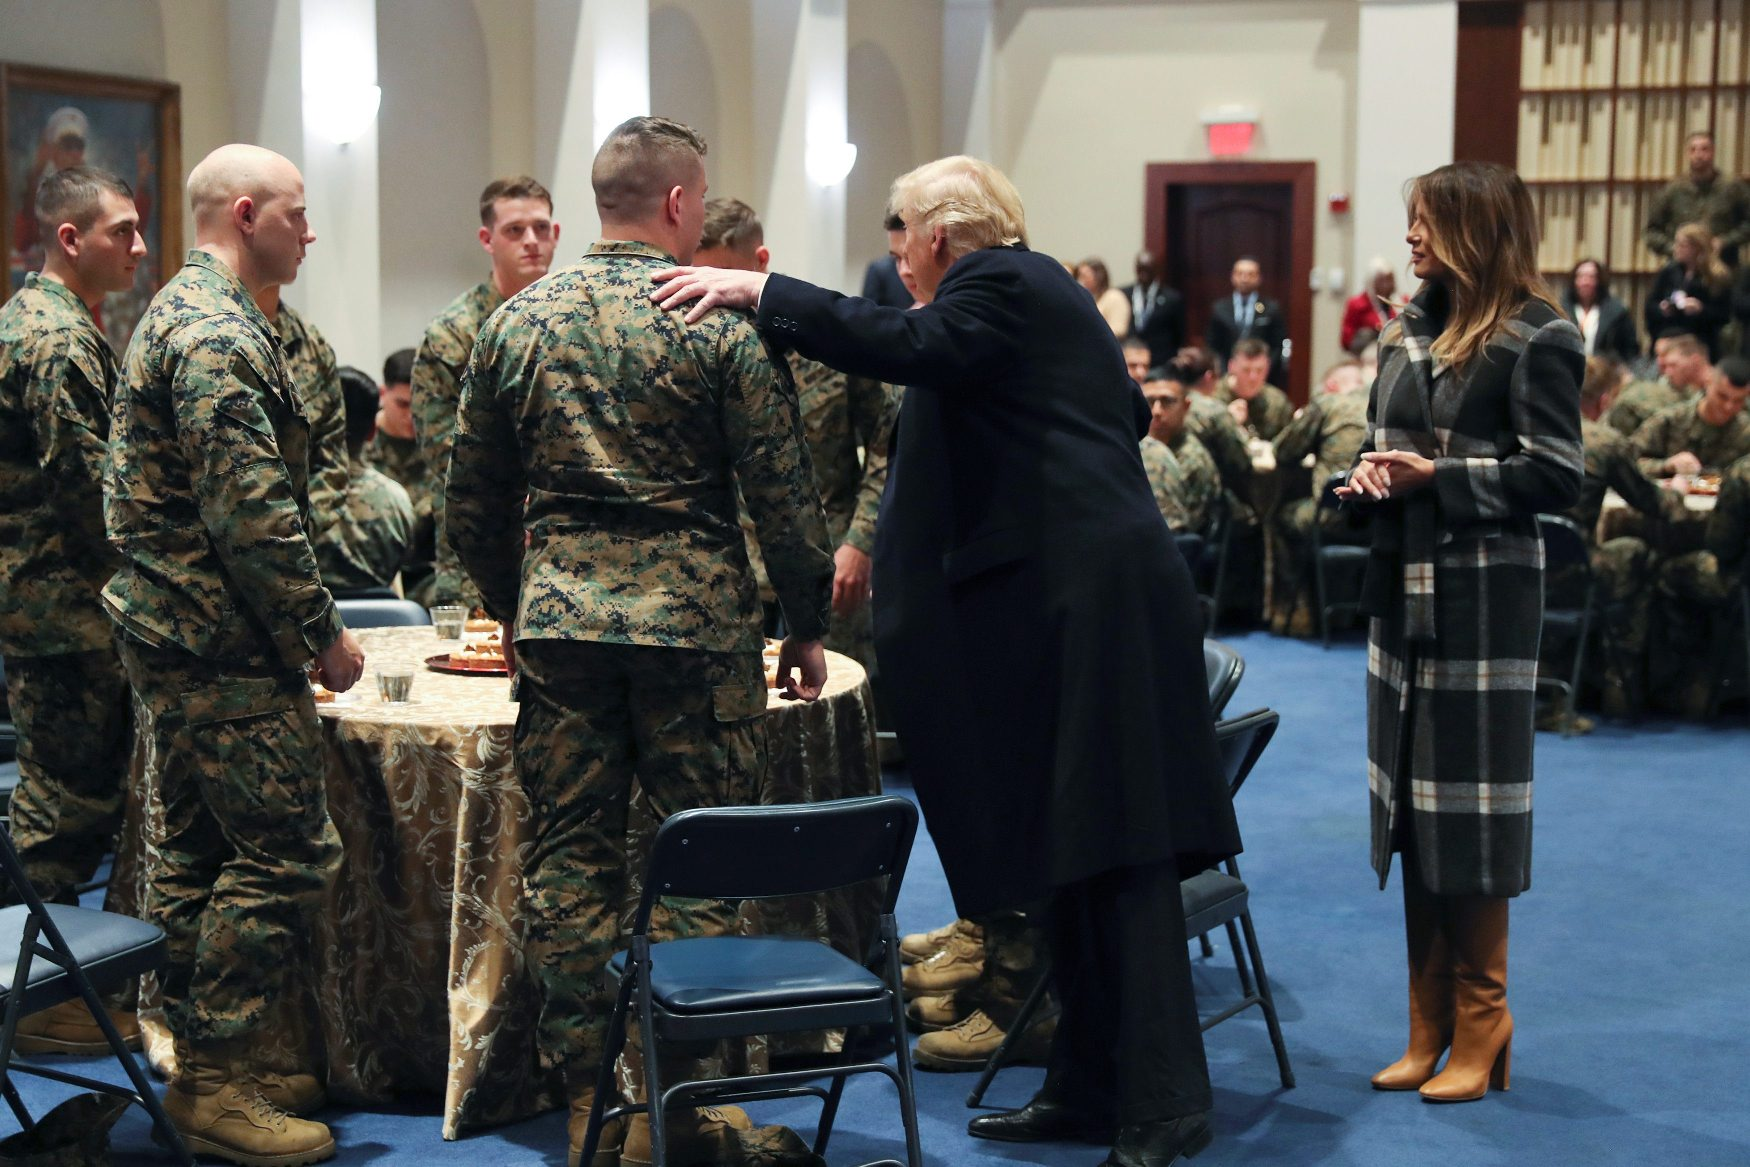 U.S. President Donald Trump and first lady Melania Trump visit U.S. Marines at the Marine Corps Barracks in Washington, U.S. November 15, 2018. REUTERS/Jonathan Ernst